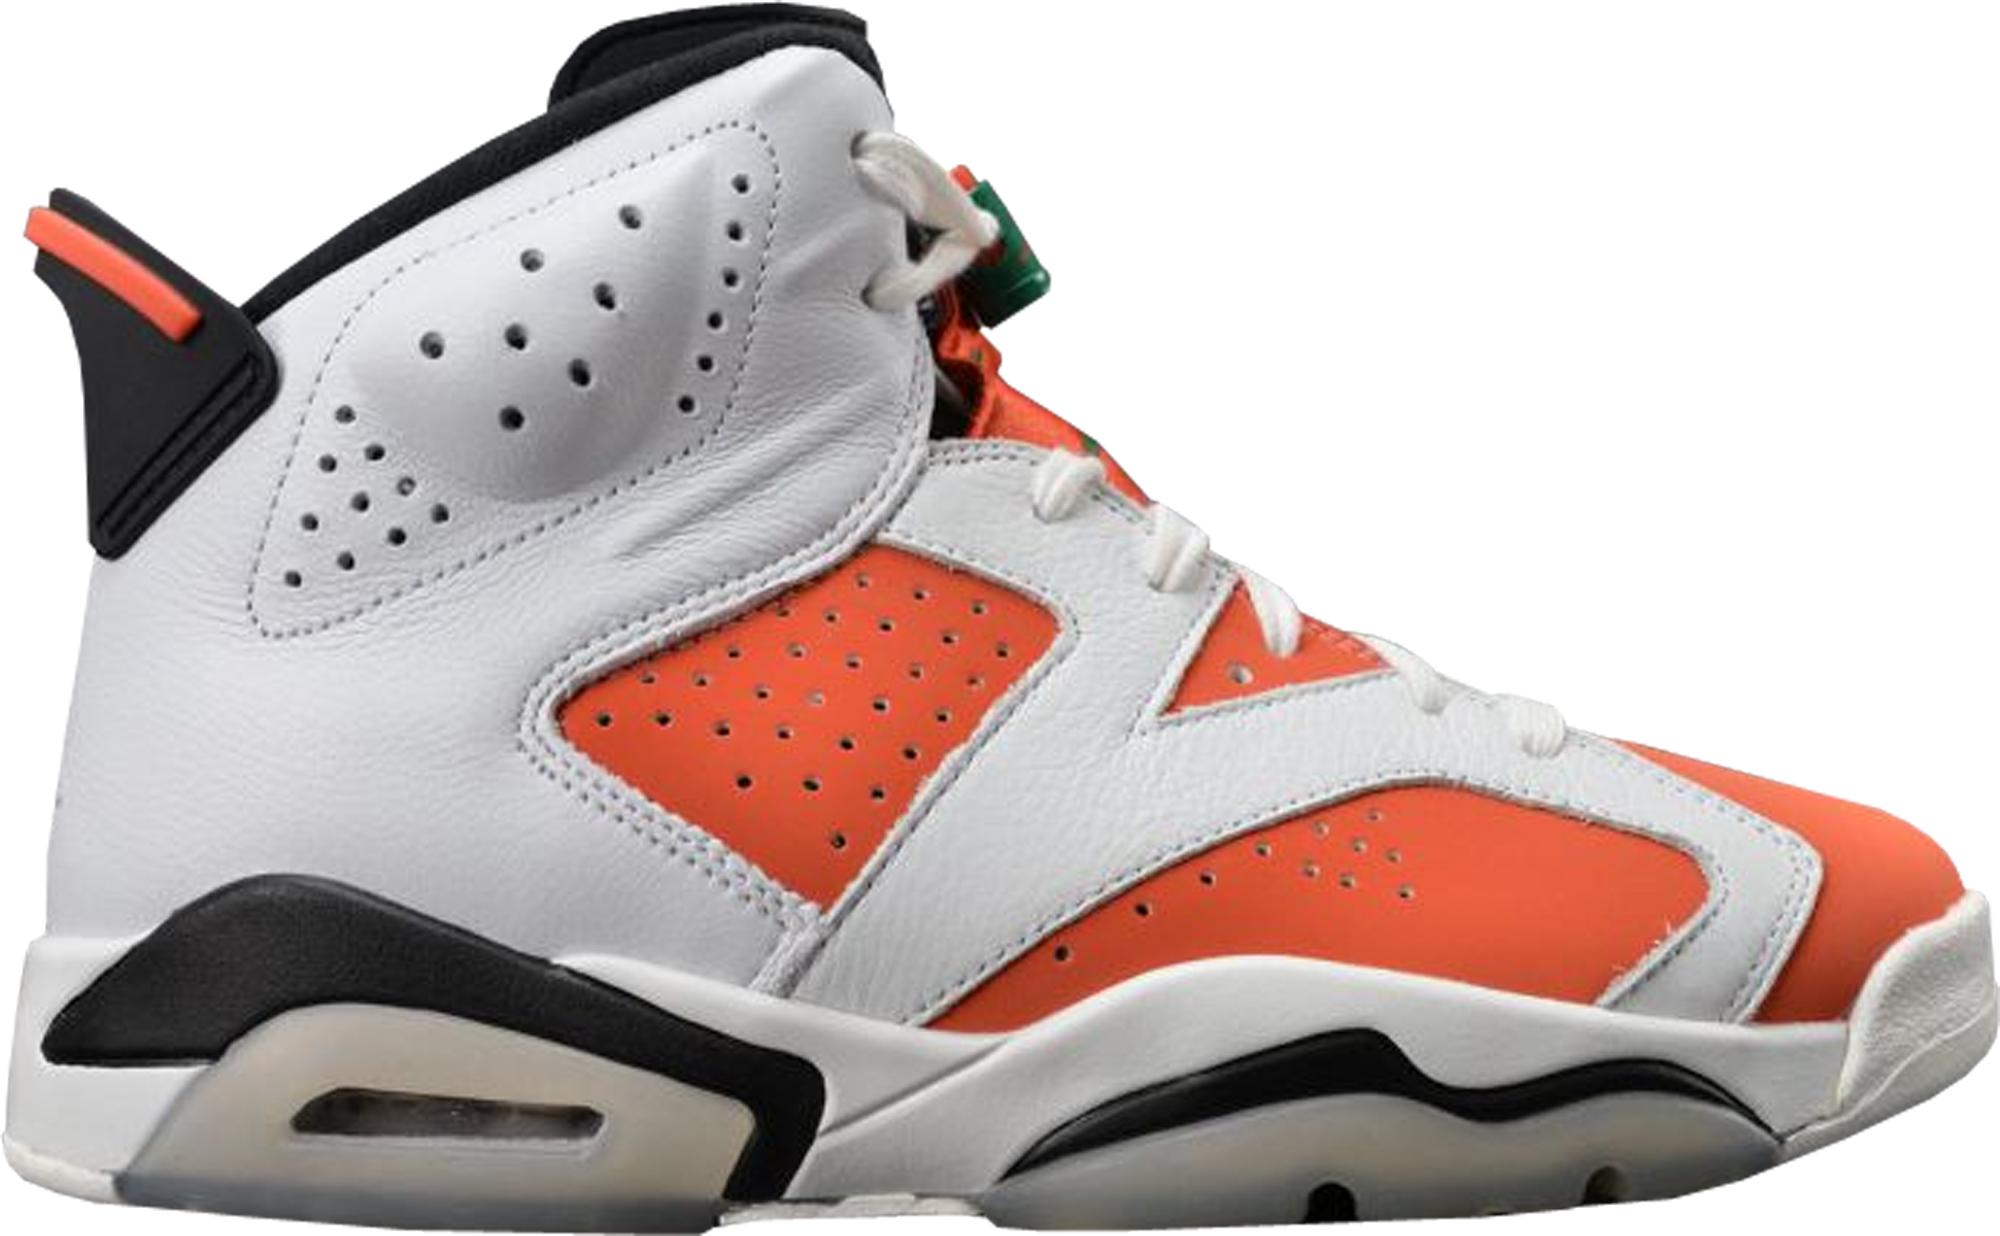 new arrivals 7347e 3273b air jordan 10 retro i m back release date sneaker